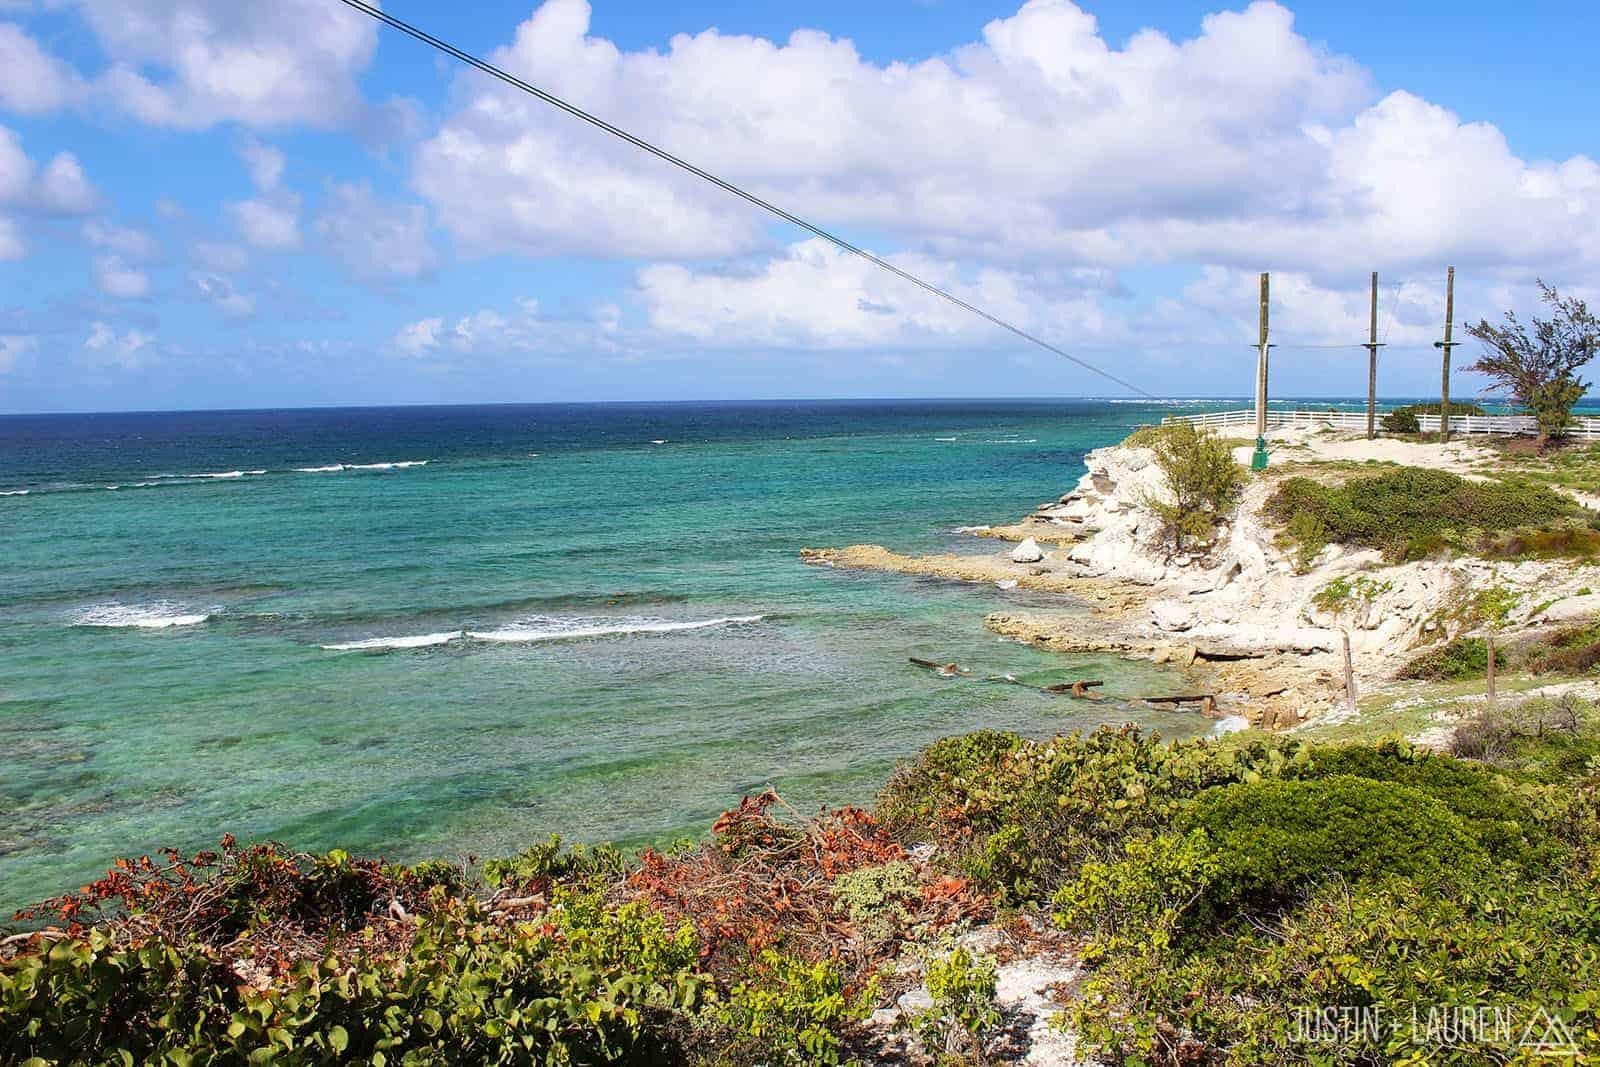 Grand Turk Lighthouse, Turks and Caicos